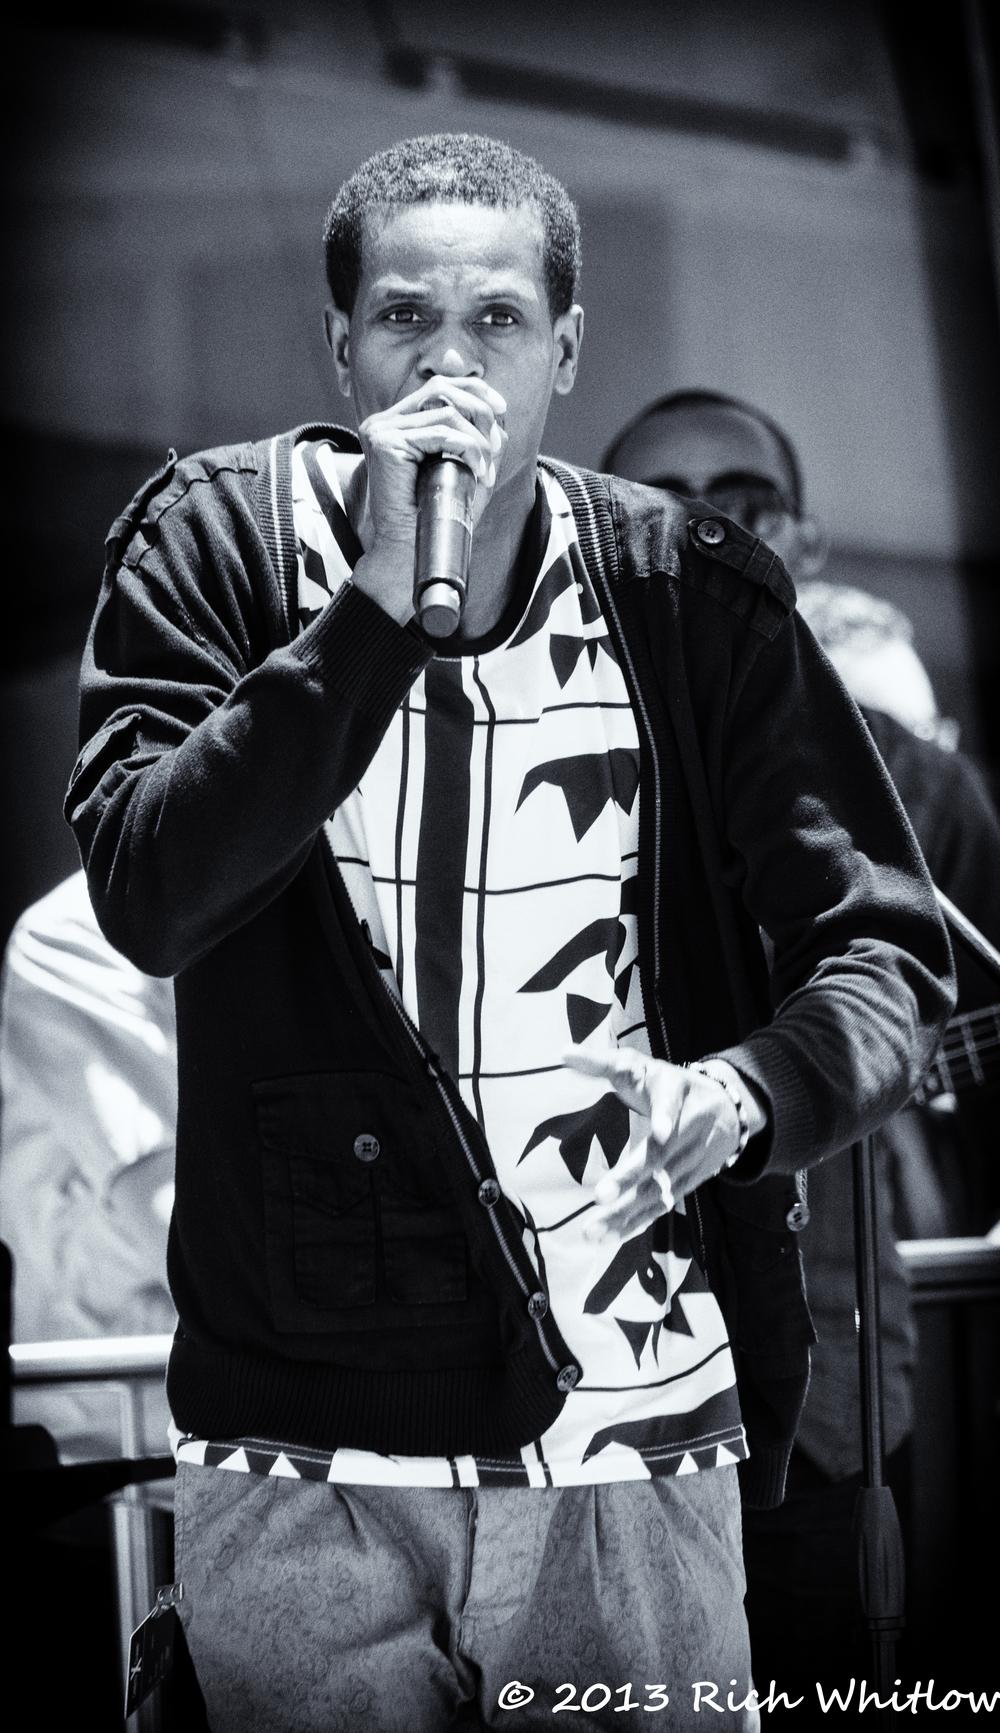 Cruise Singer/Rapper